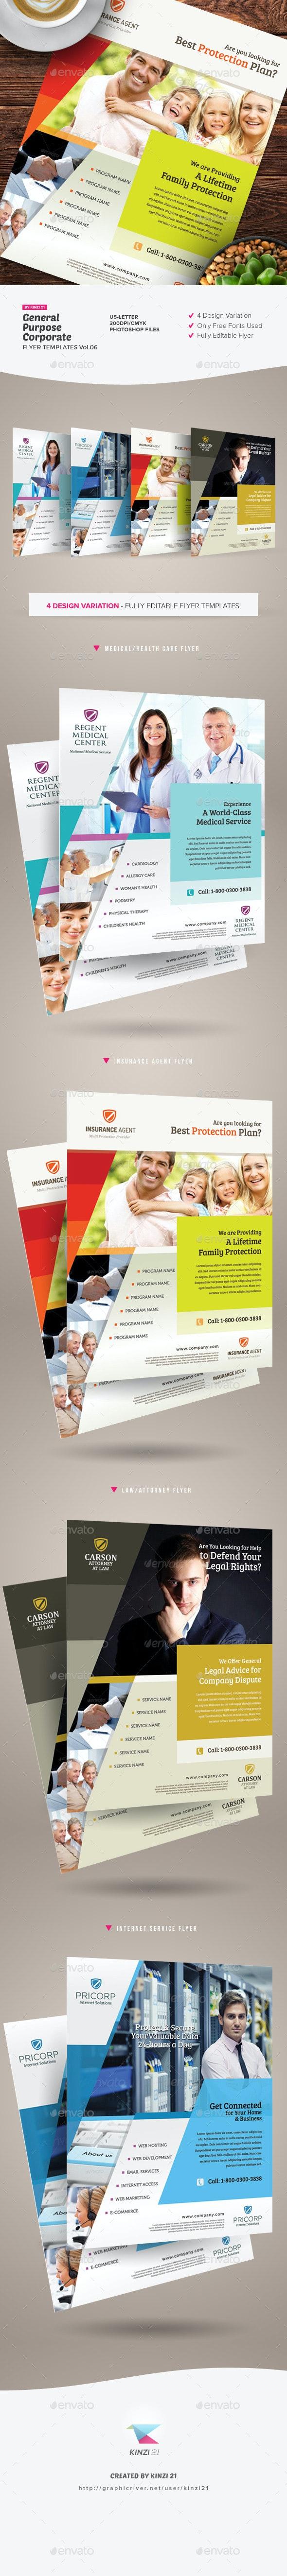 General Purpose Corporate Flyer Vol.06 - Corporate Flyers